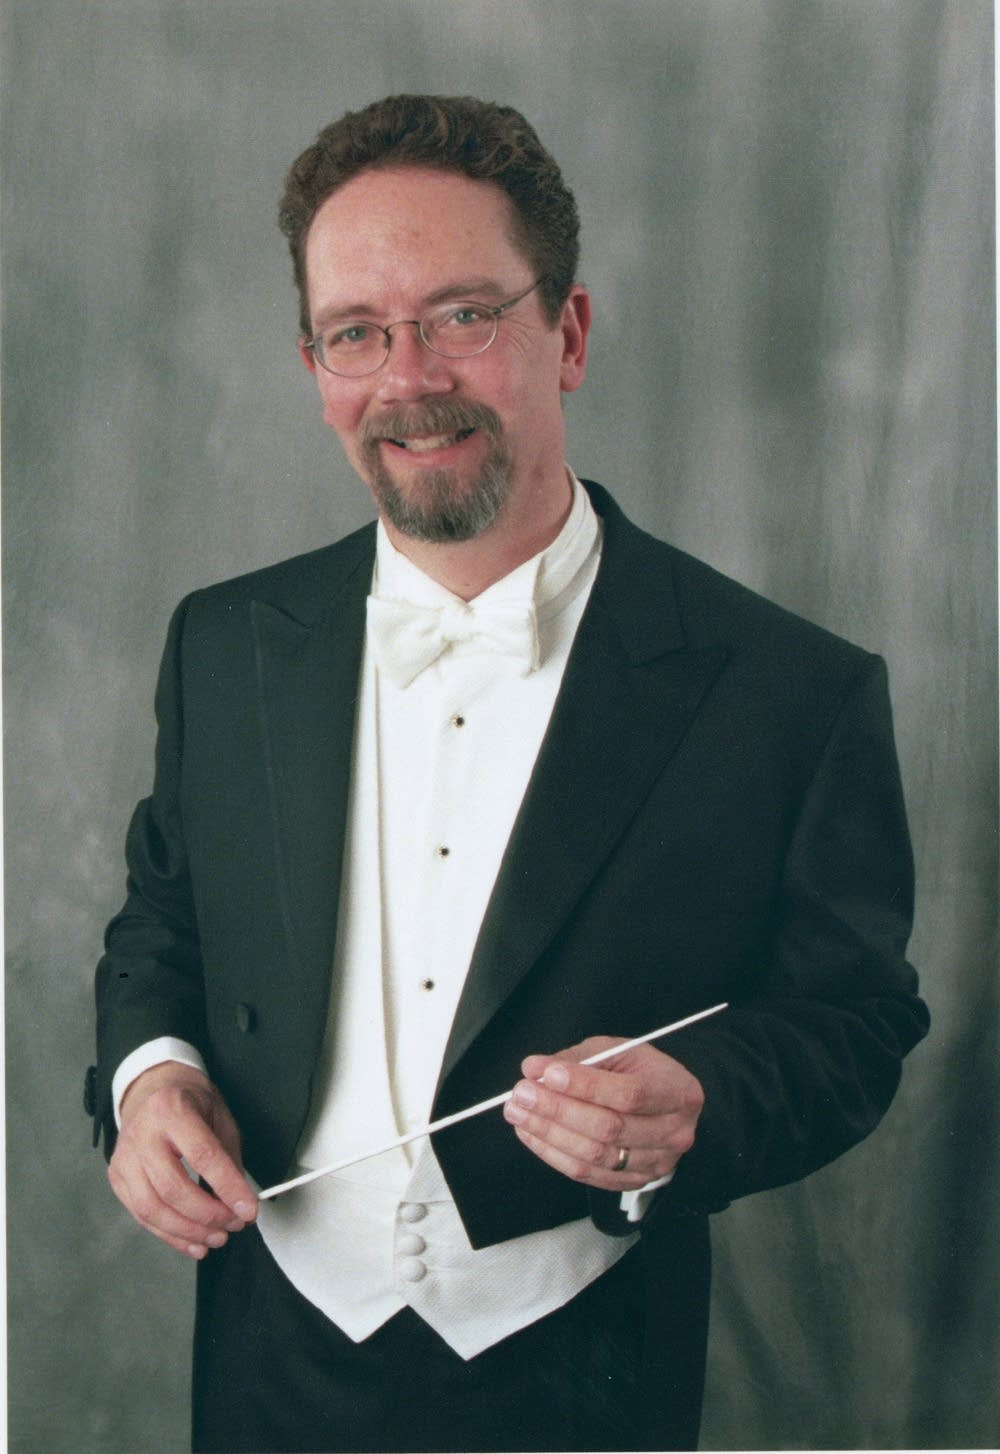 Bill Schrickel